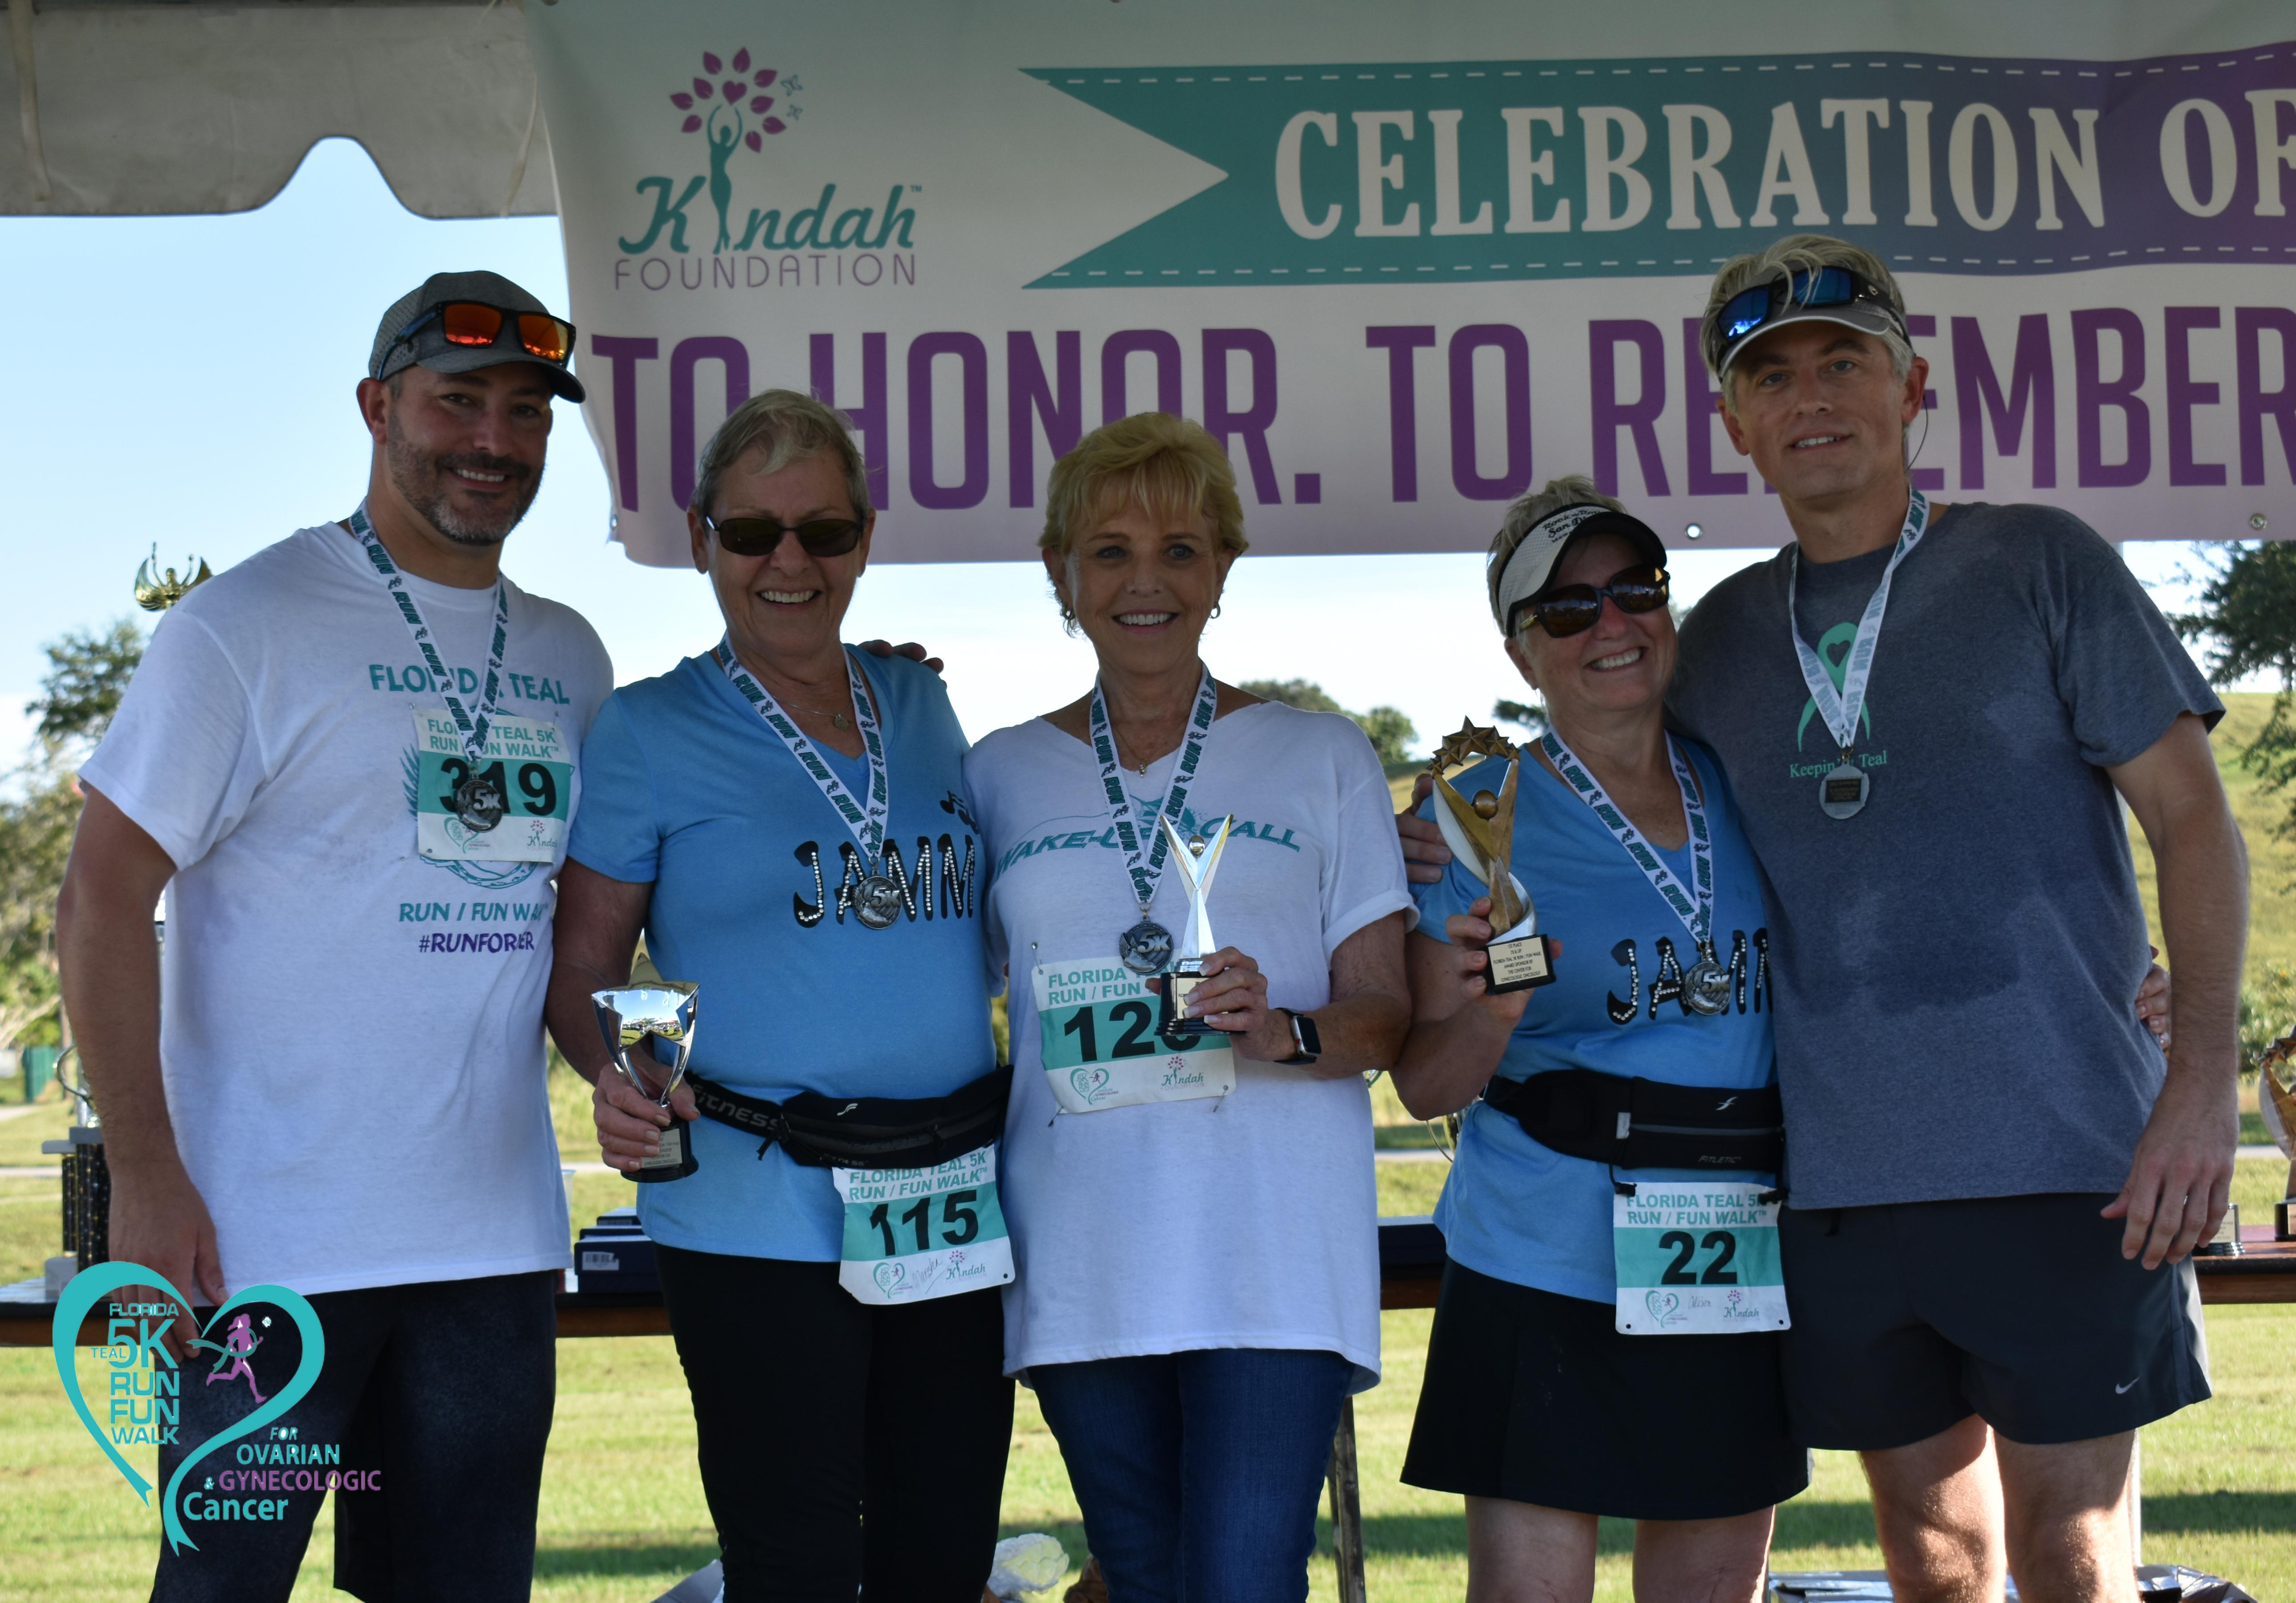 DSC 0177 - Florida Teal 5K Run 2018